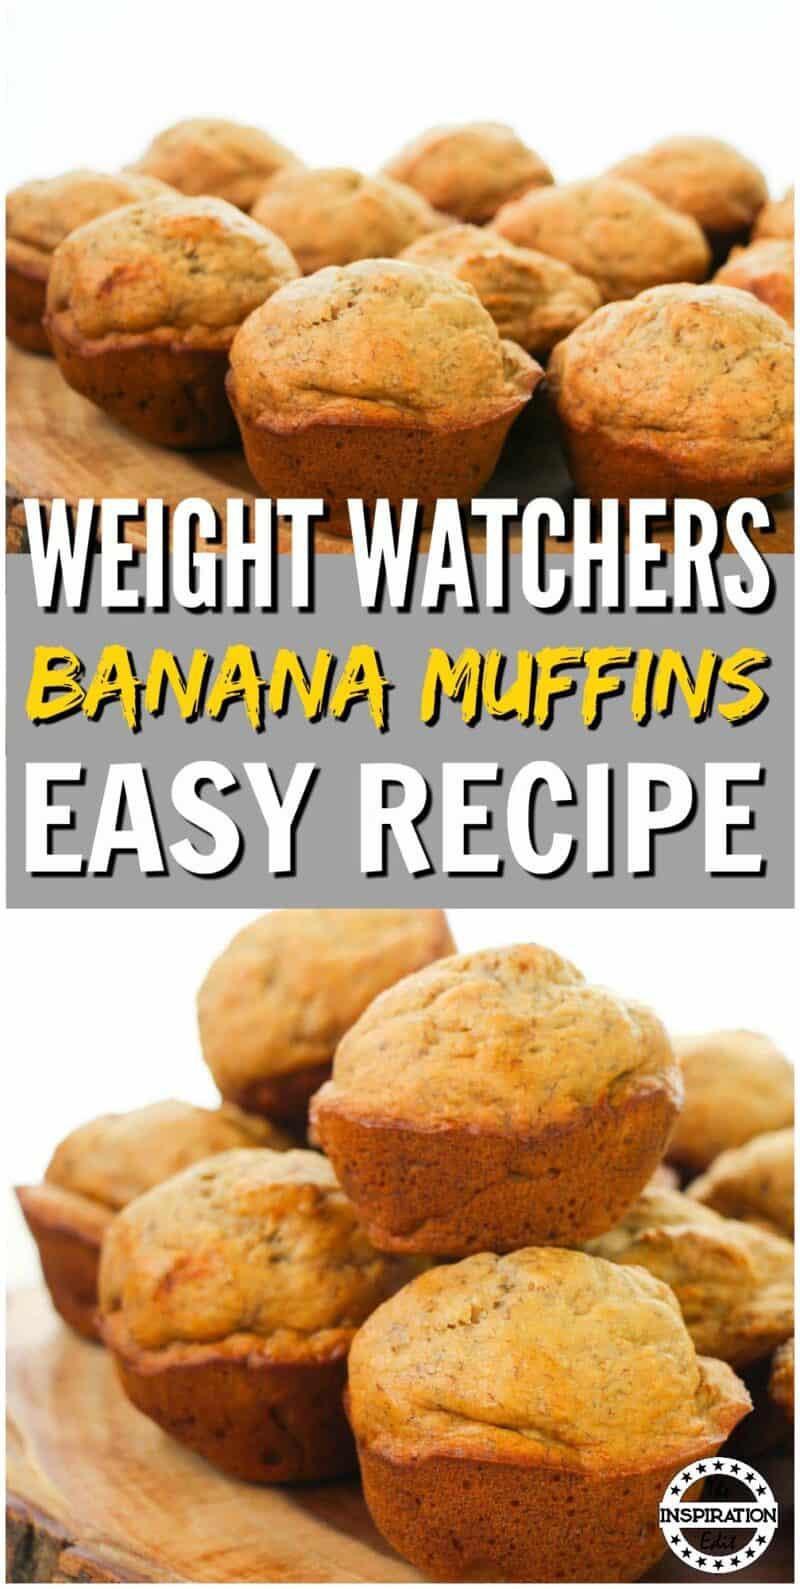 Weight Watchers Banana Recipes  Weight Watchers Banana Muffins Gluten Free · The